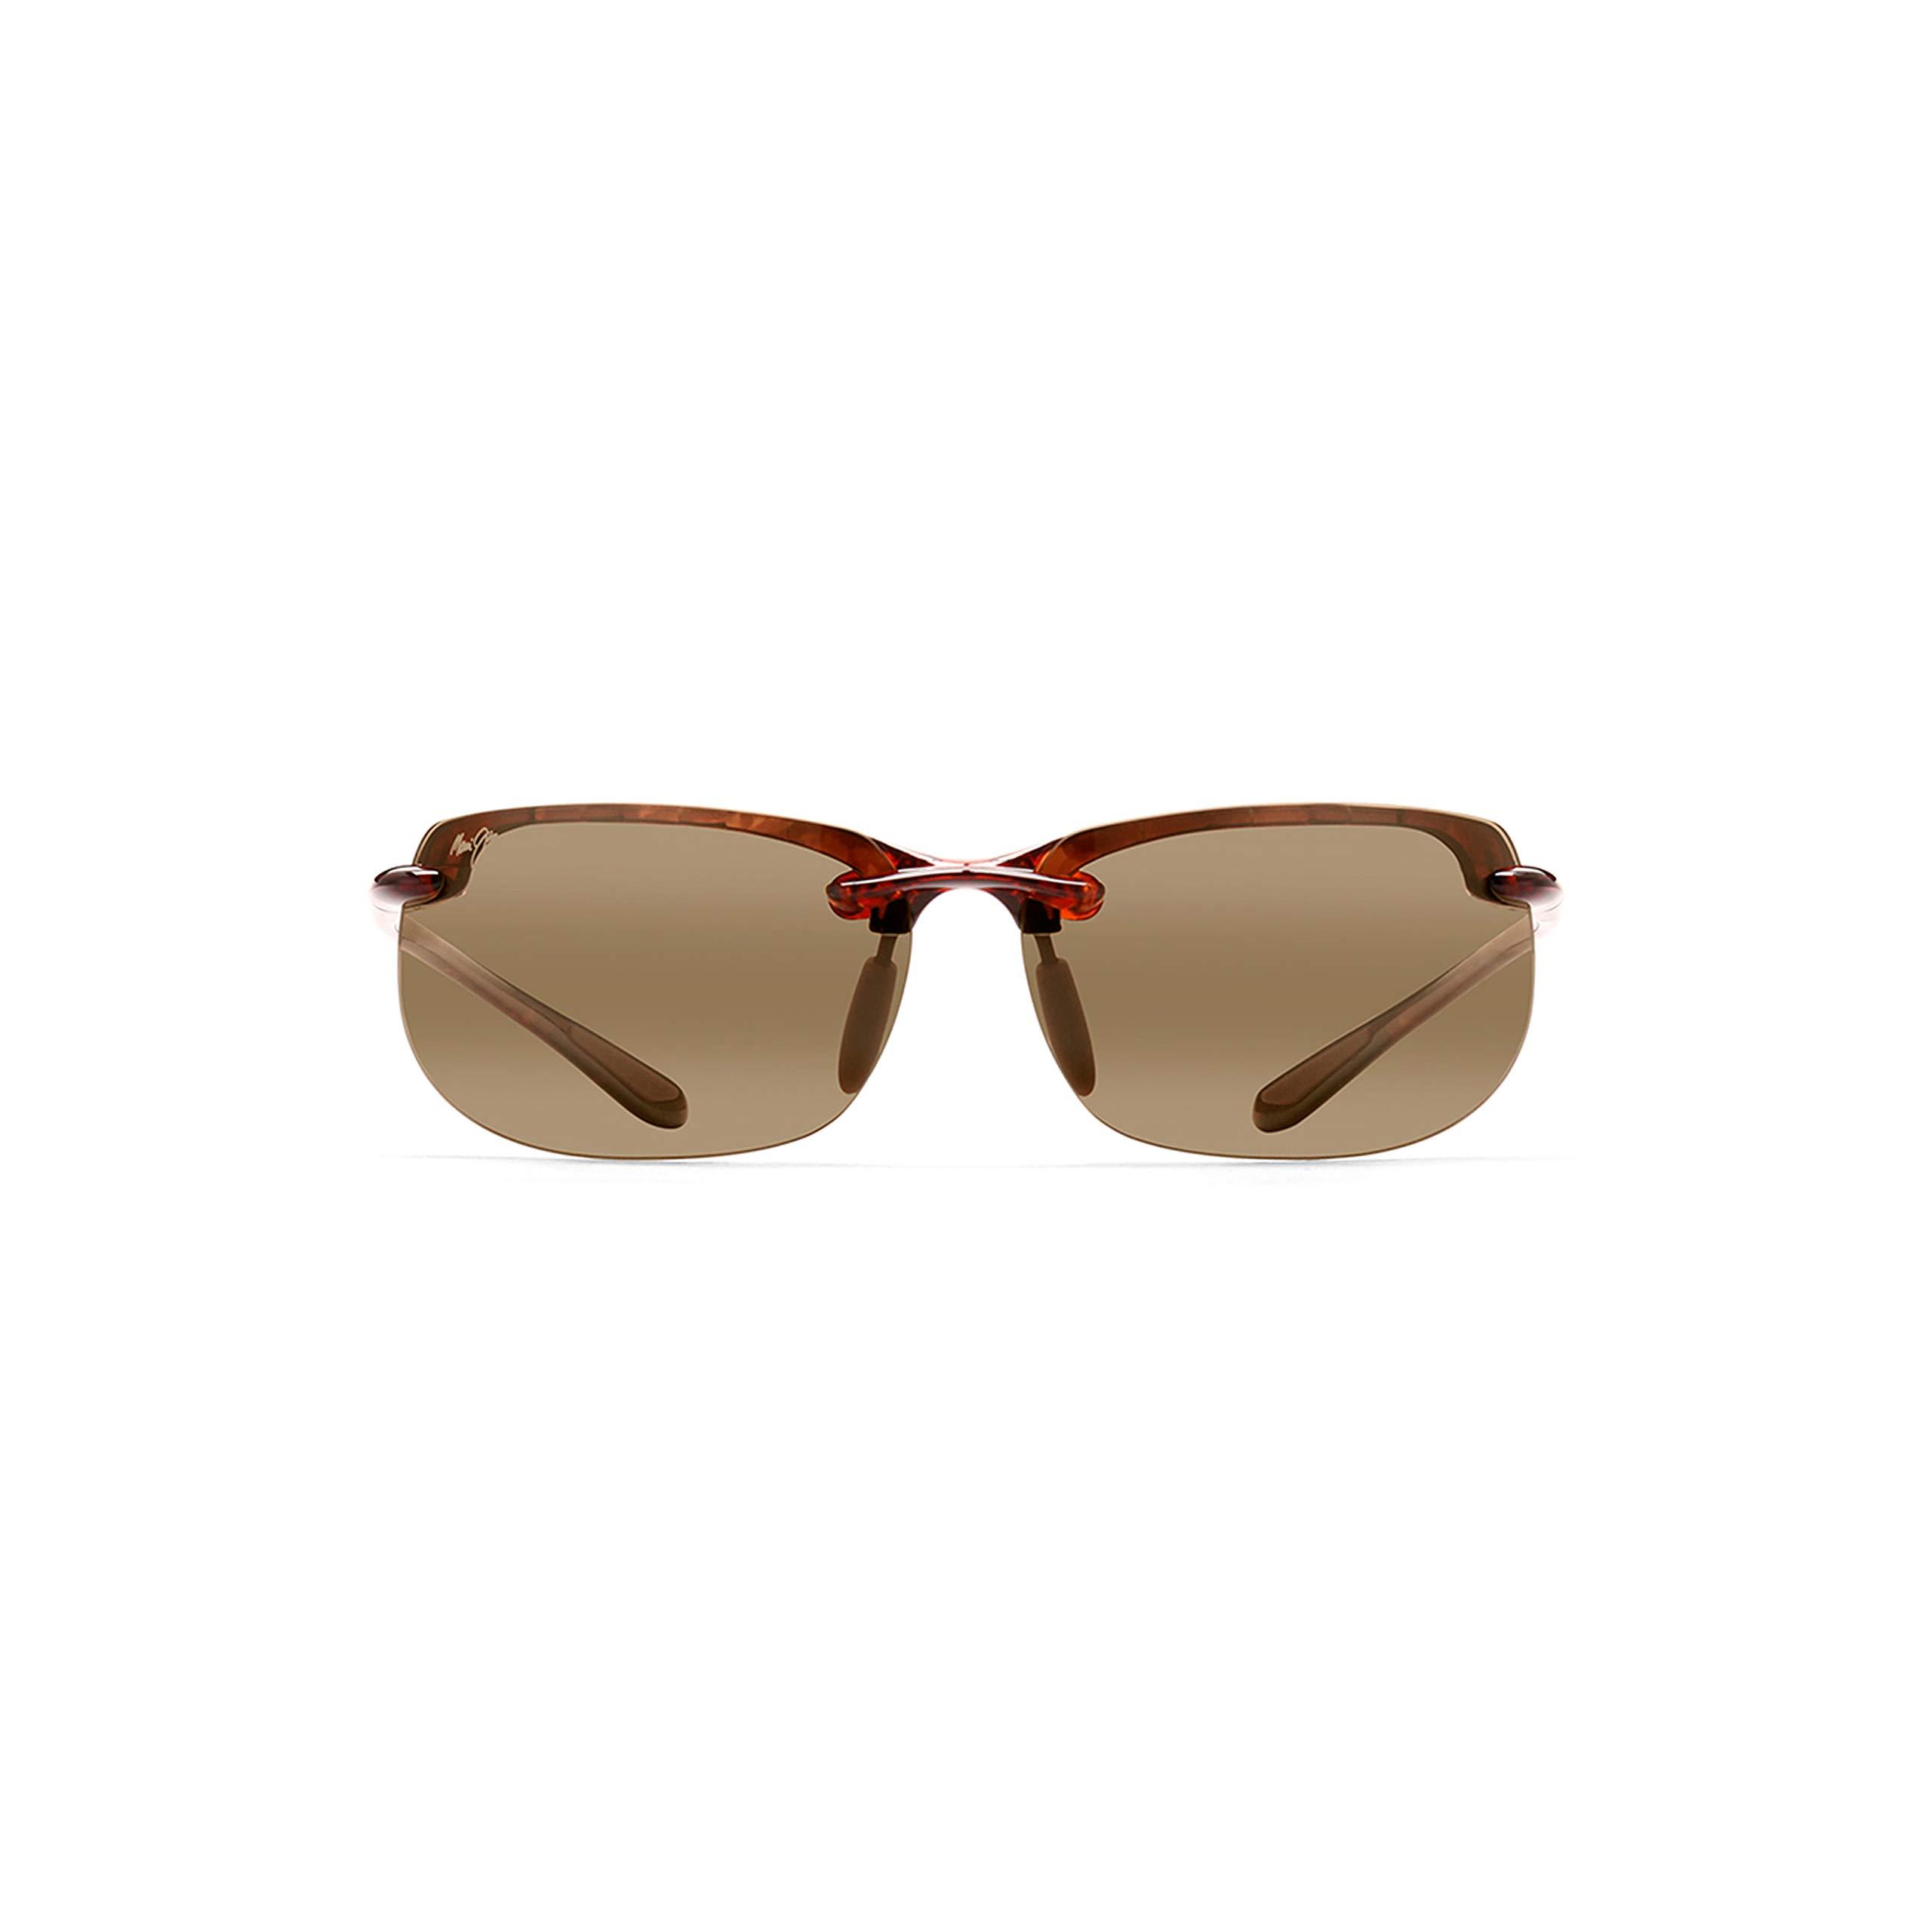 Maui Jim Sunglasses   Banyans H412-10  , HCL Bronze Lenses, with Patented PolarizedPlus2 Lens Technology by Maui Jim